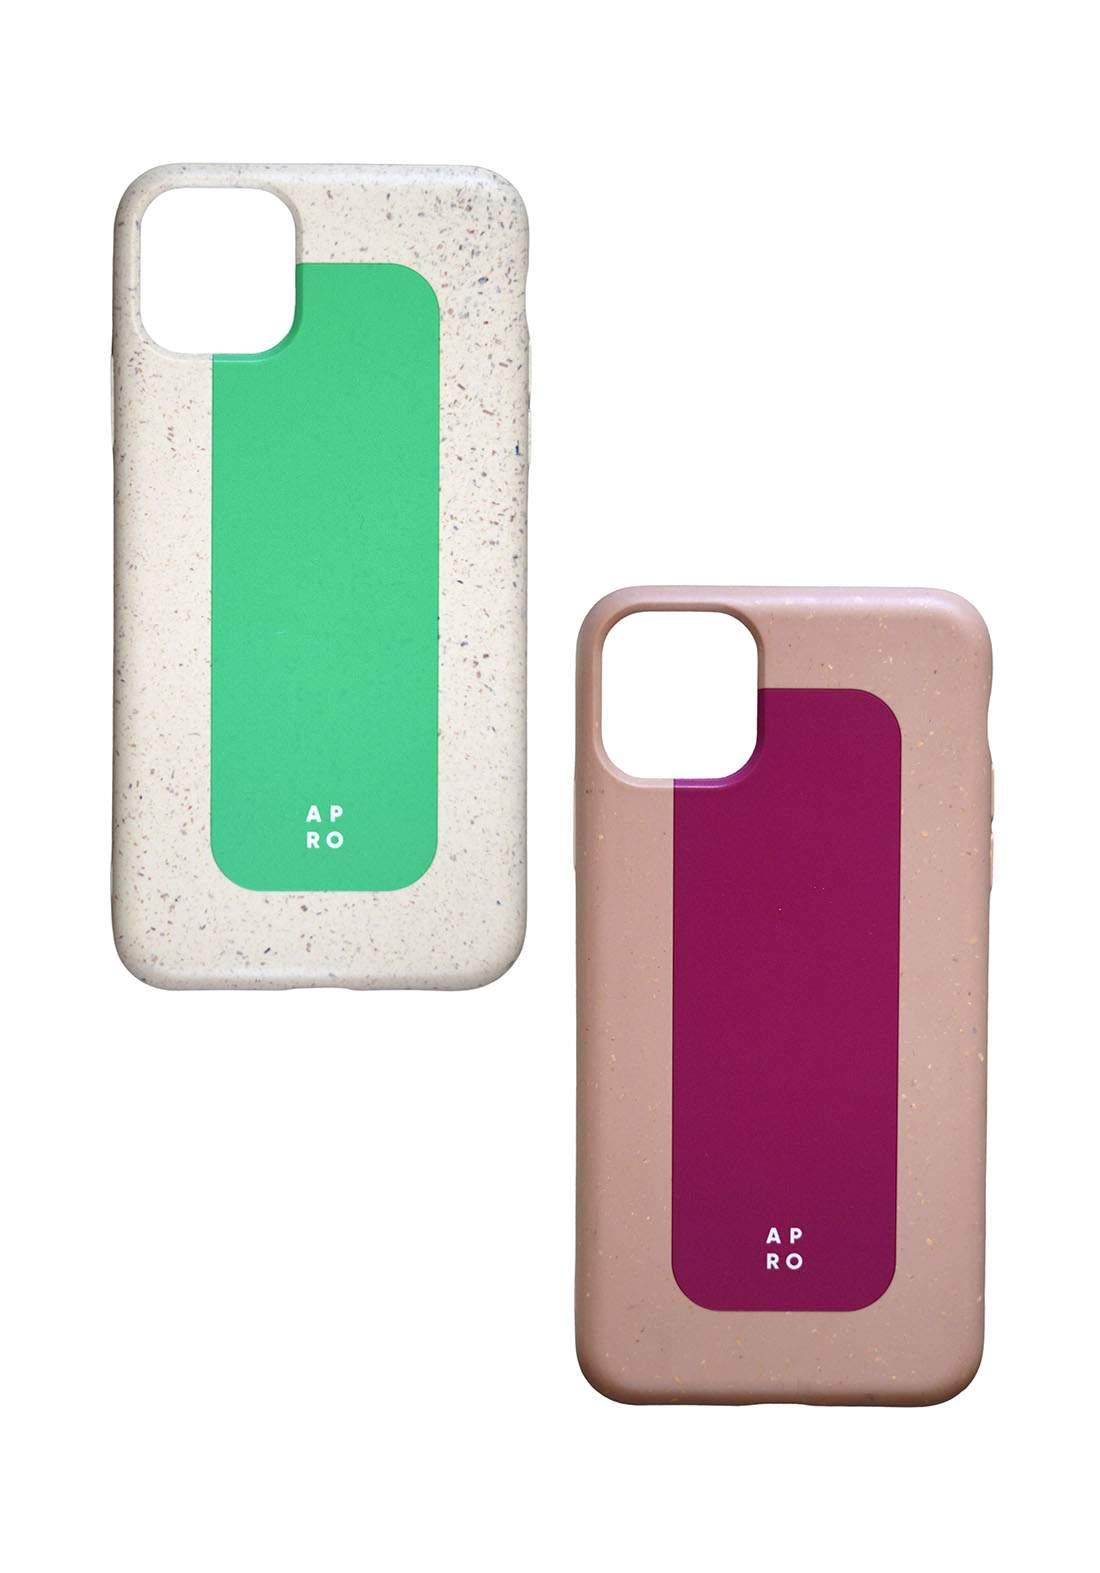 Apro Protective Cover For Iphone 11 Pro Max حافظة موبايل